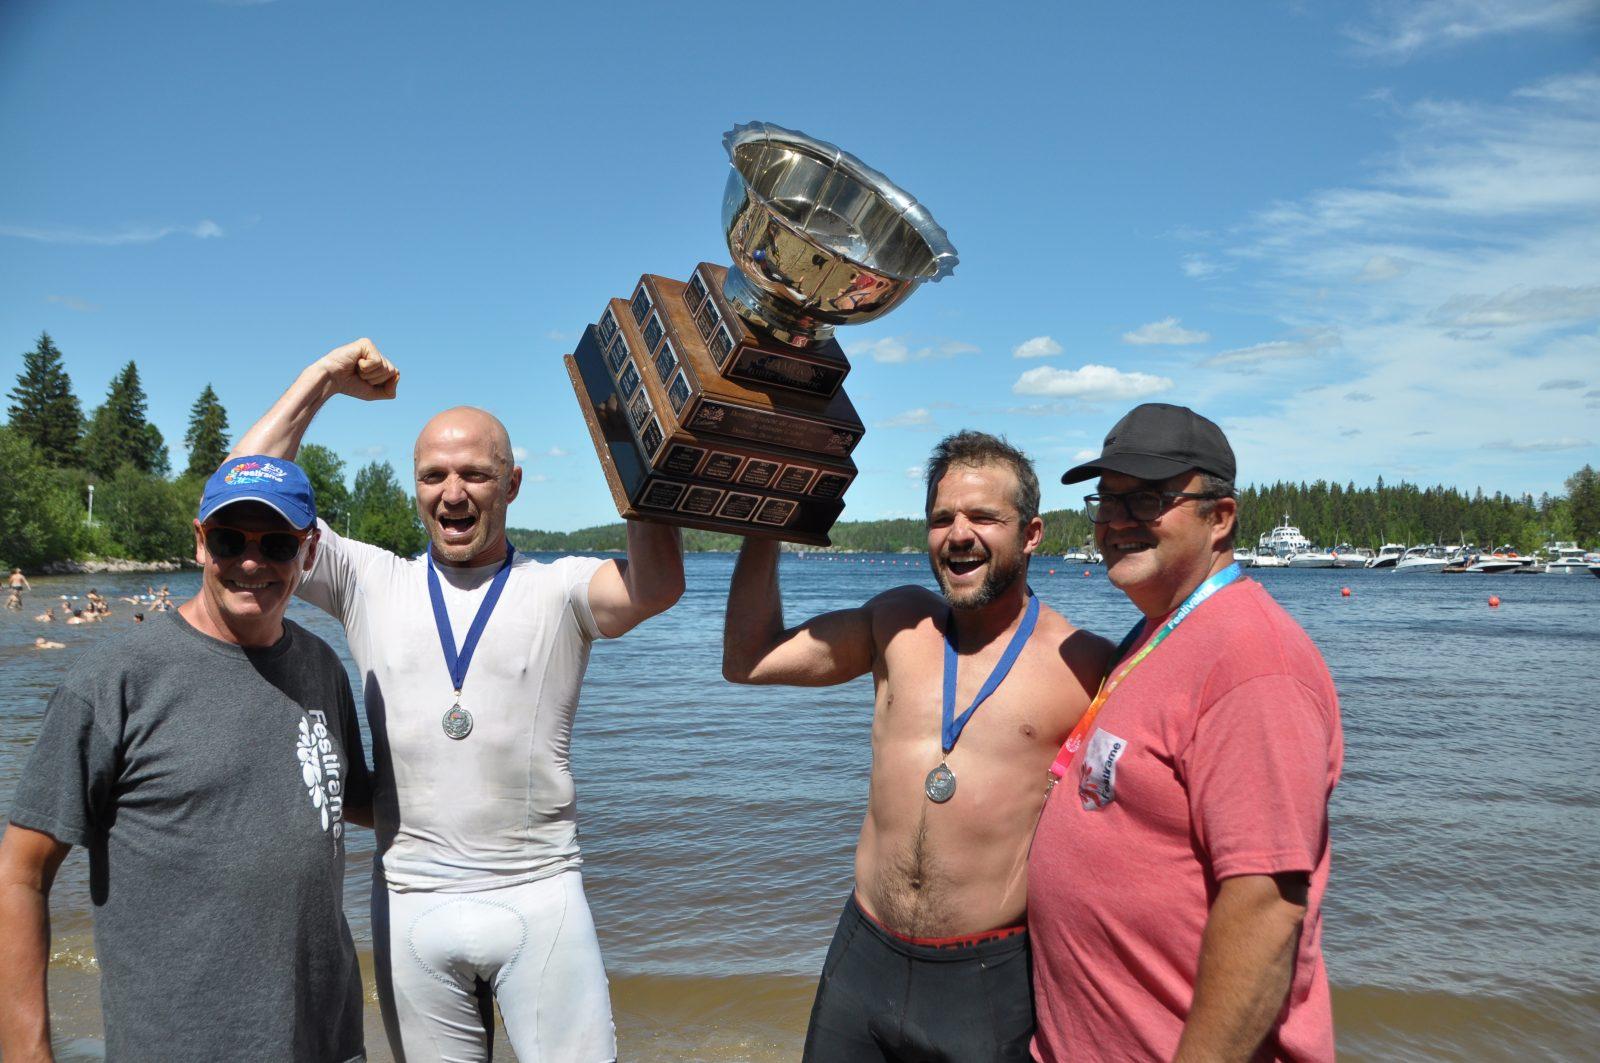 Marathon Proco Festirame: Samuel Lapointe et Nicolas Proulx sont les grands vainqueurs!